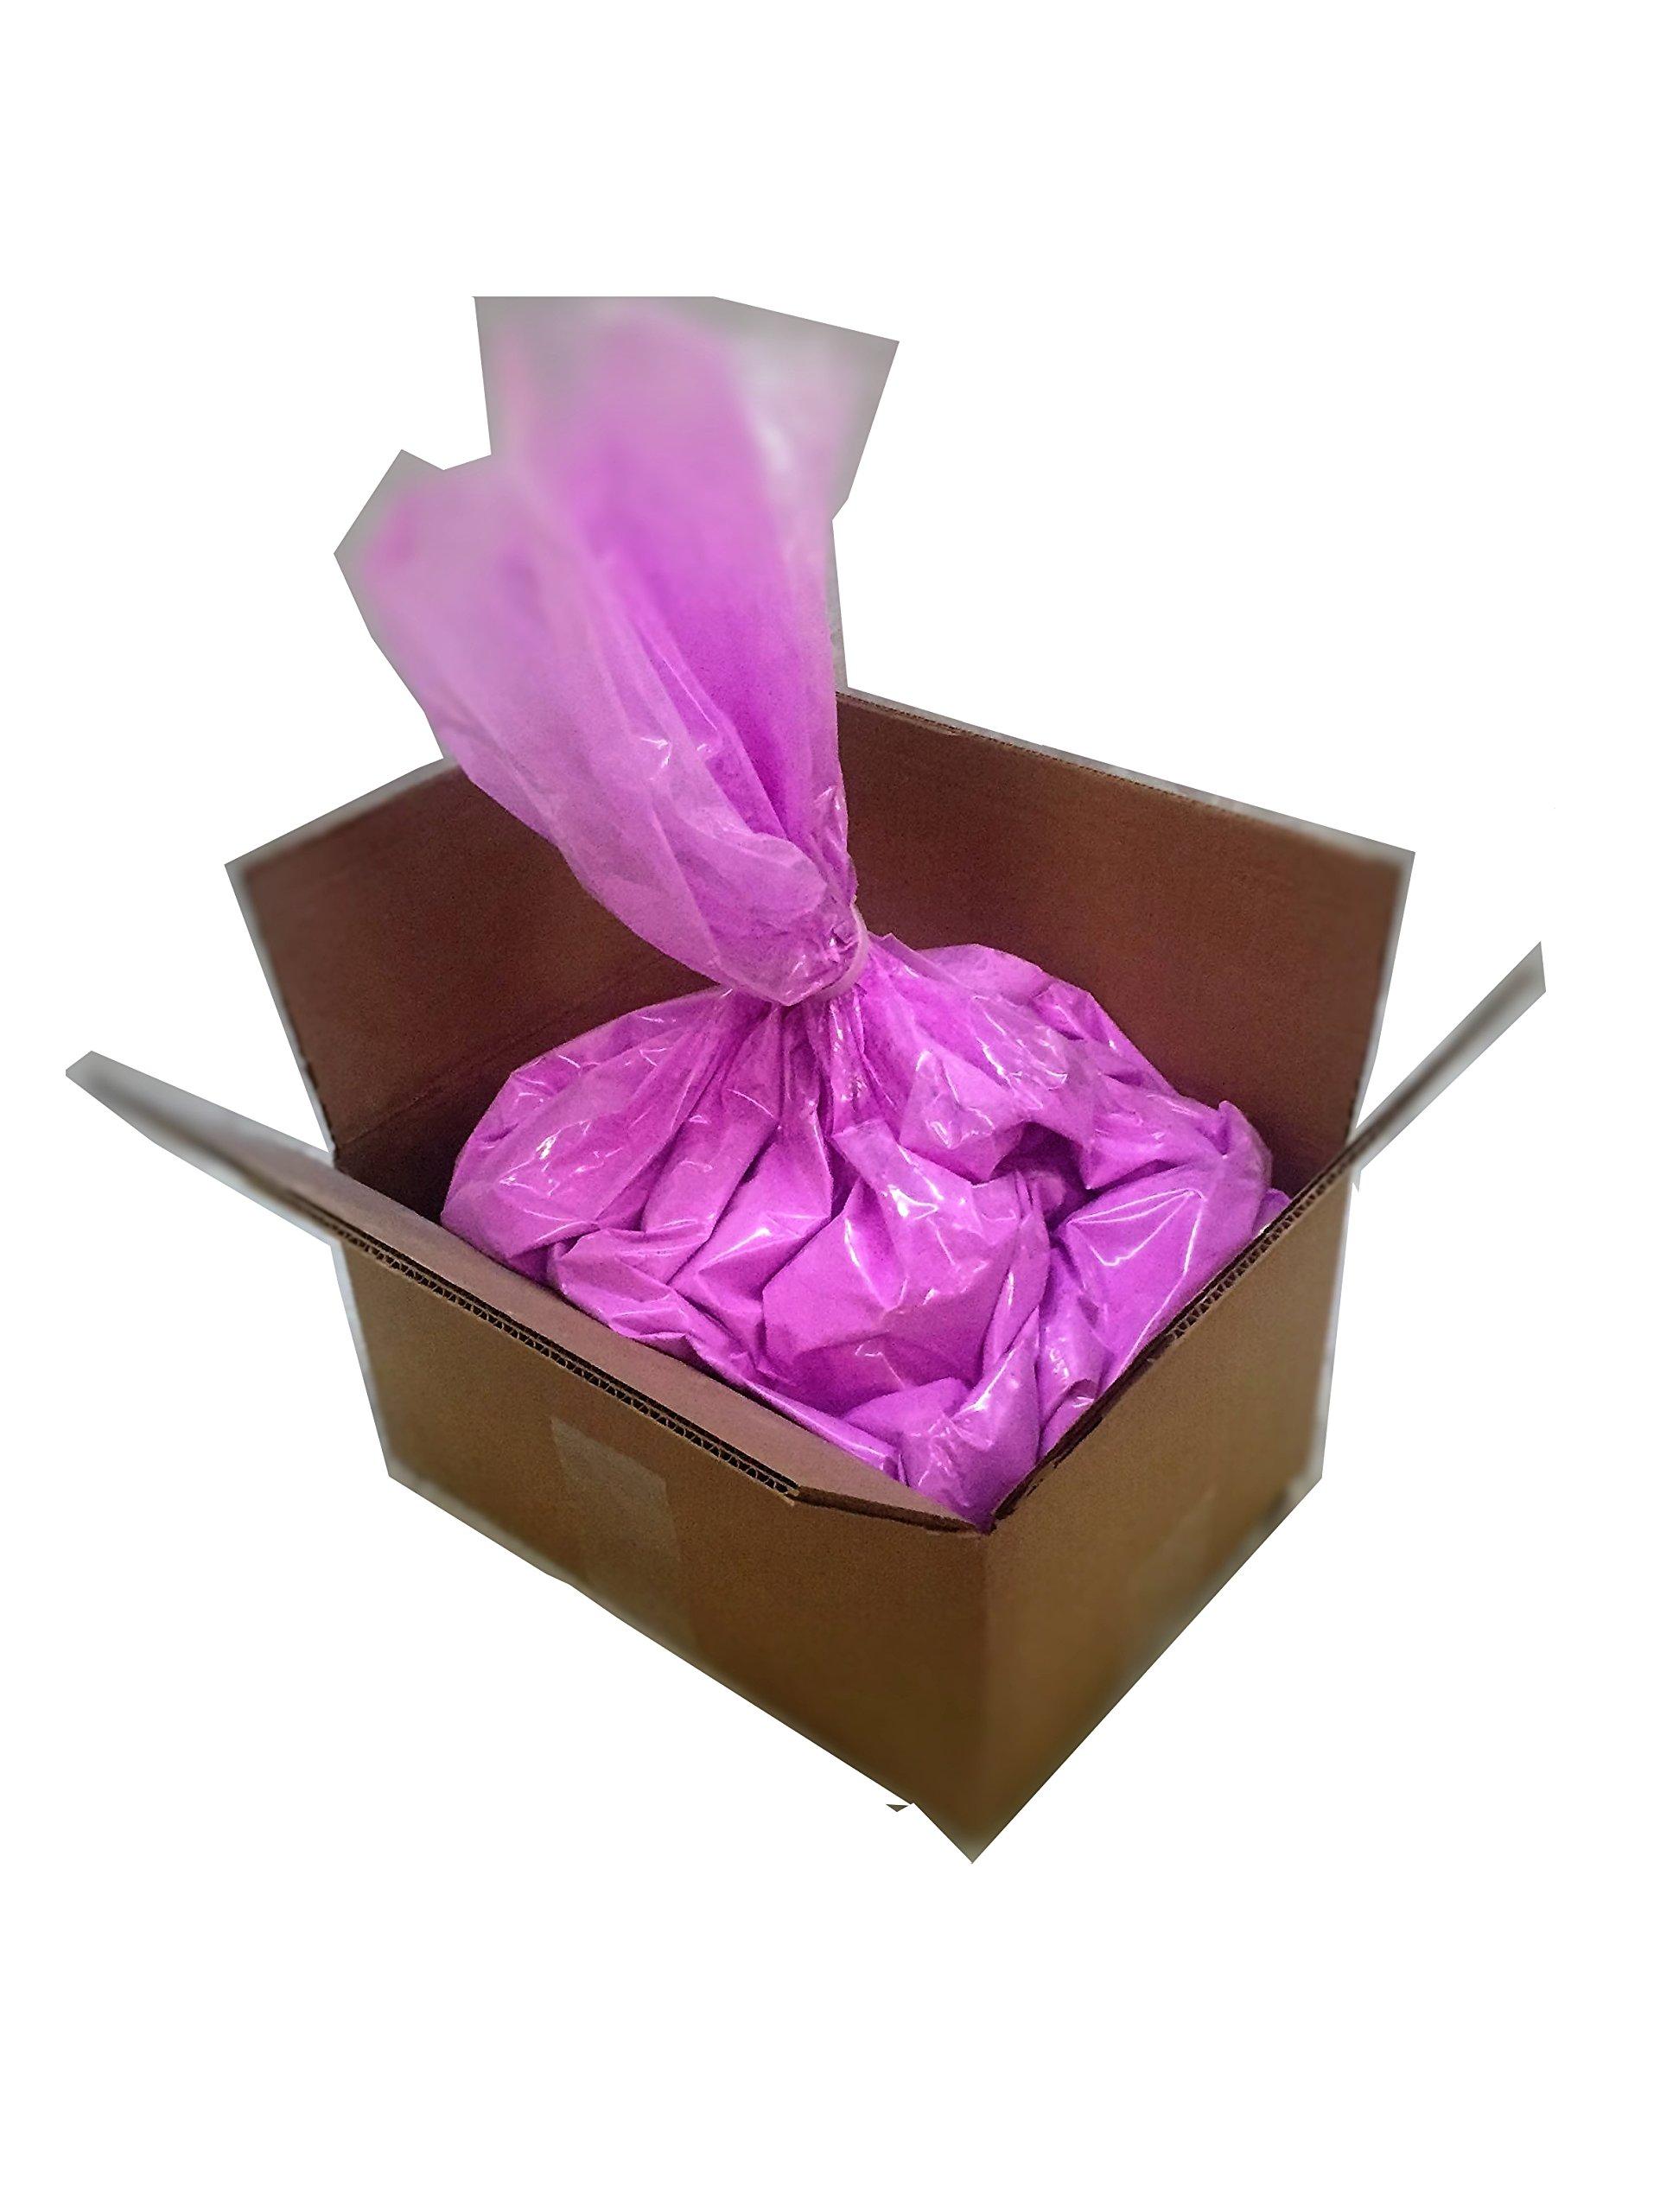 Holi Color Powder | Celebration Powder | Neon/Afterdark Purple | Bulk 25 lbs.